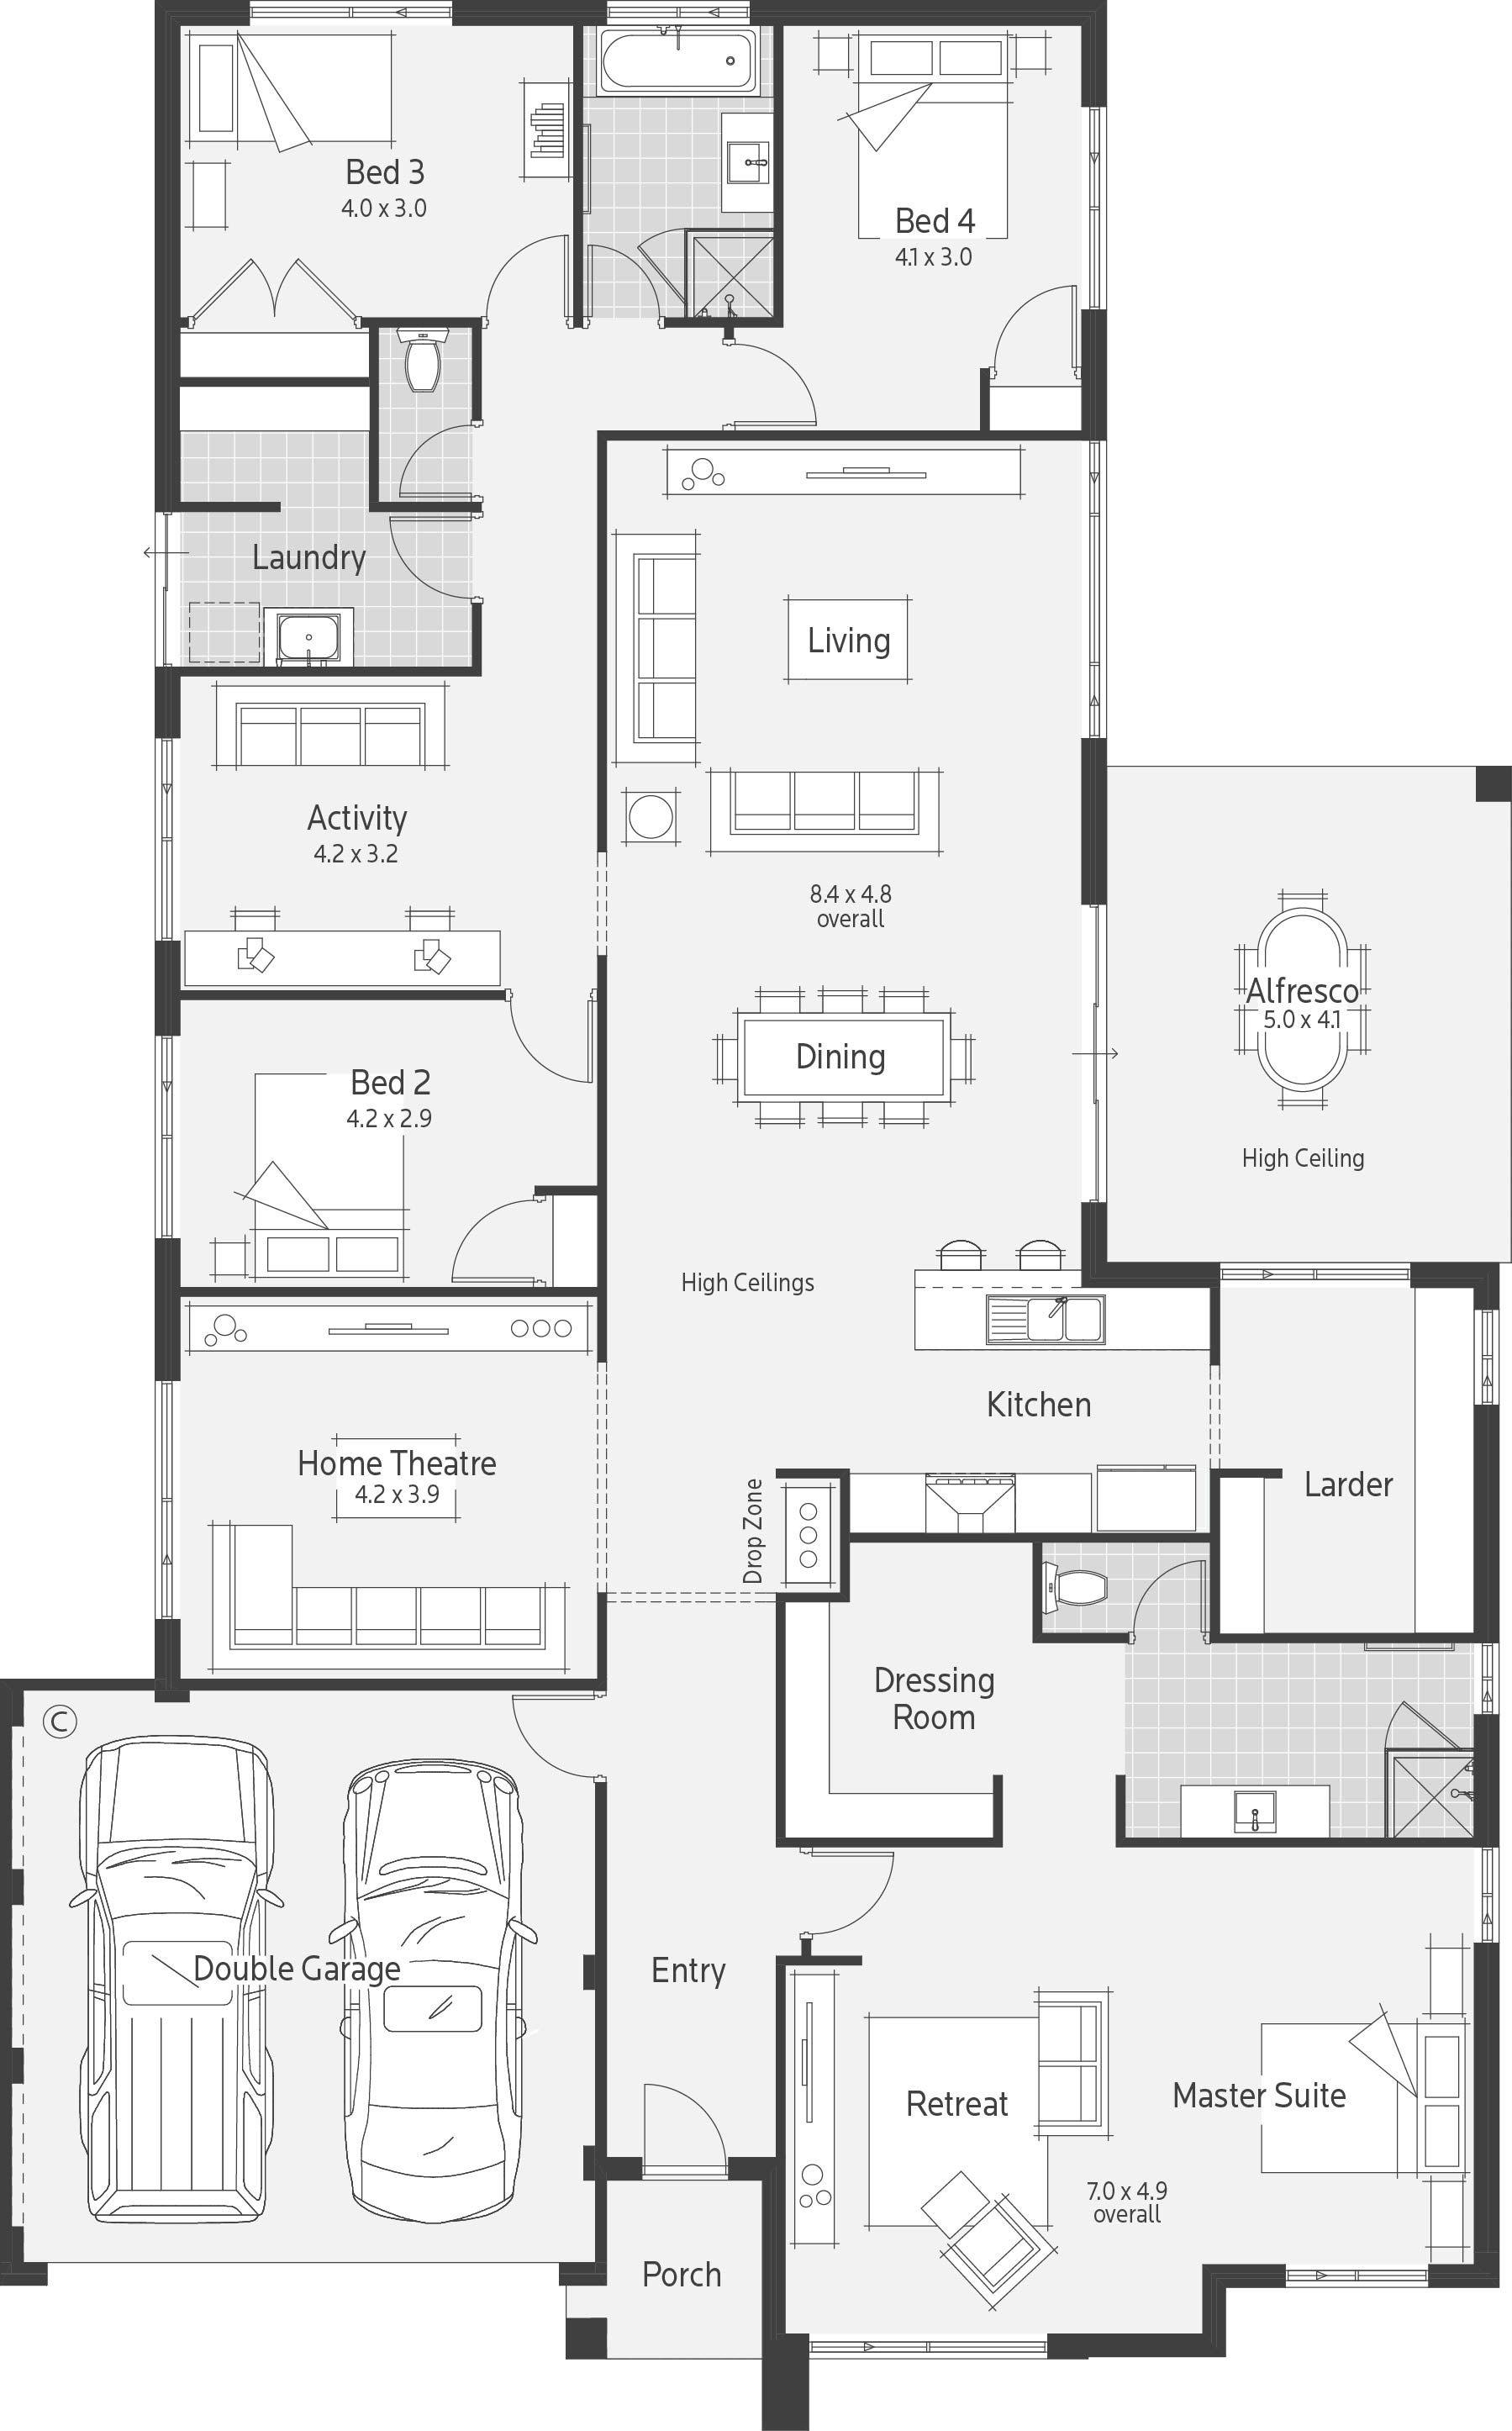 Room Floor Plan Designer Free: Kitchen Floor Plans, House